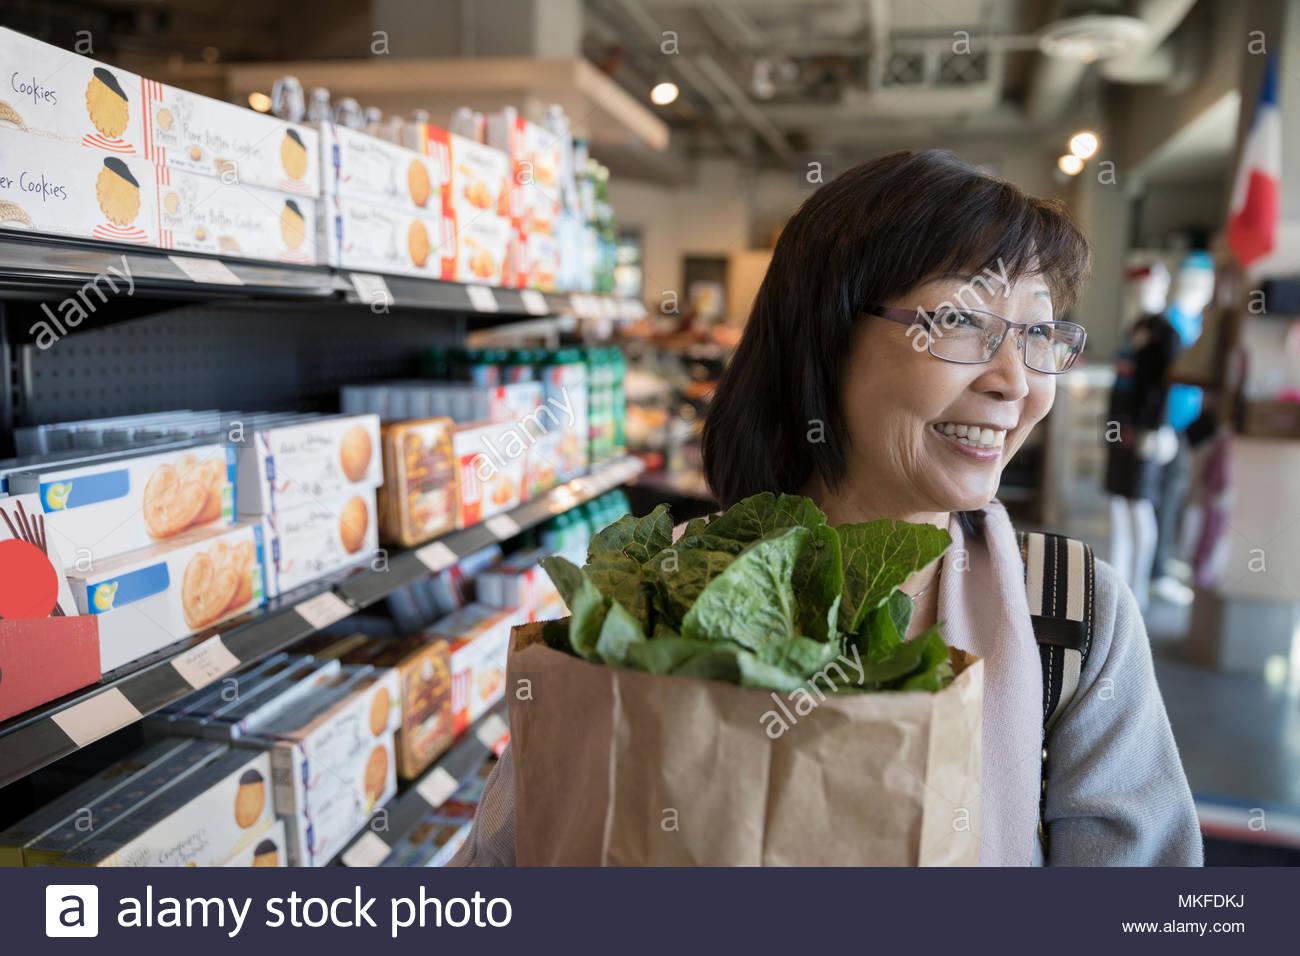 Smiling female senior woman grocery shopping in market aisle - Stock Image